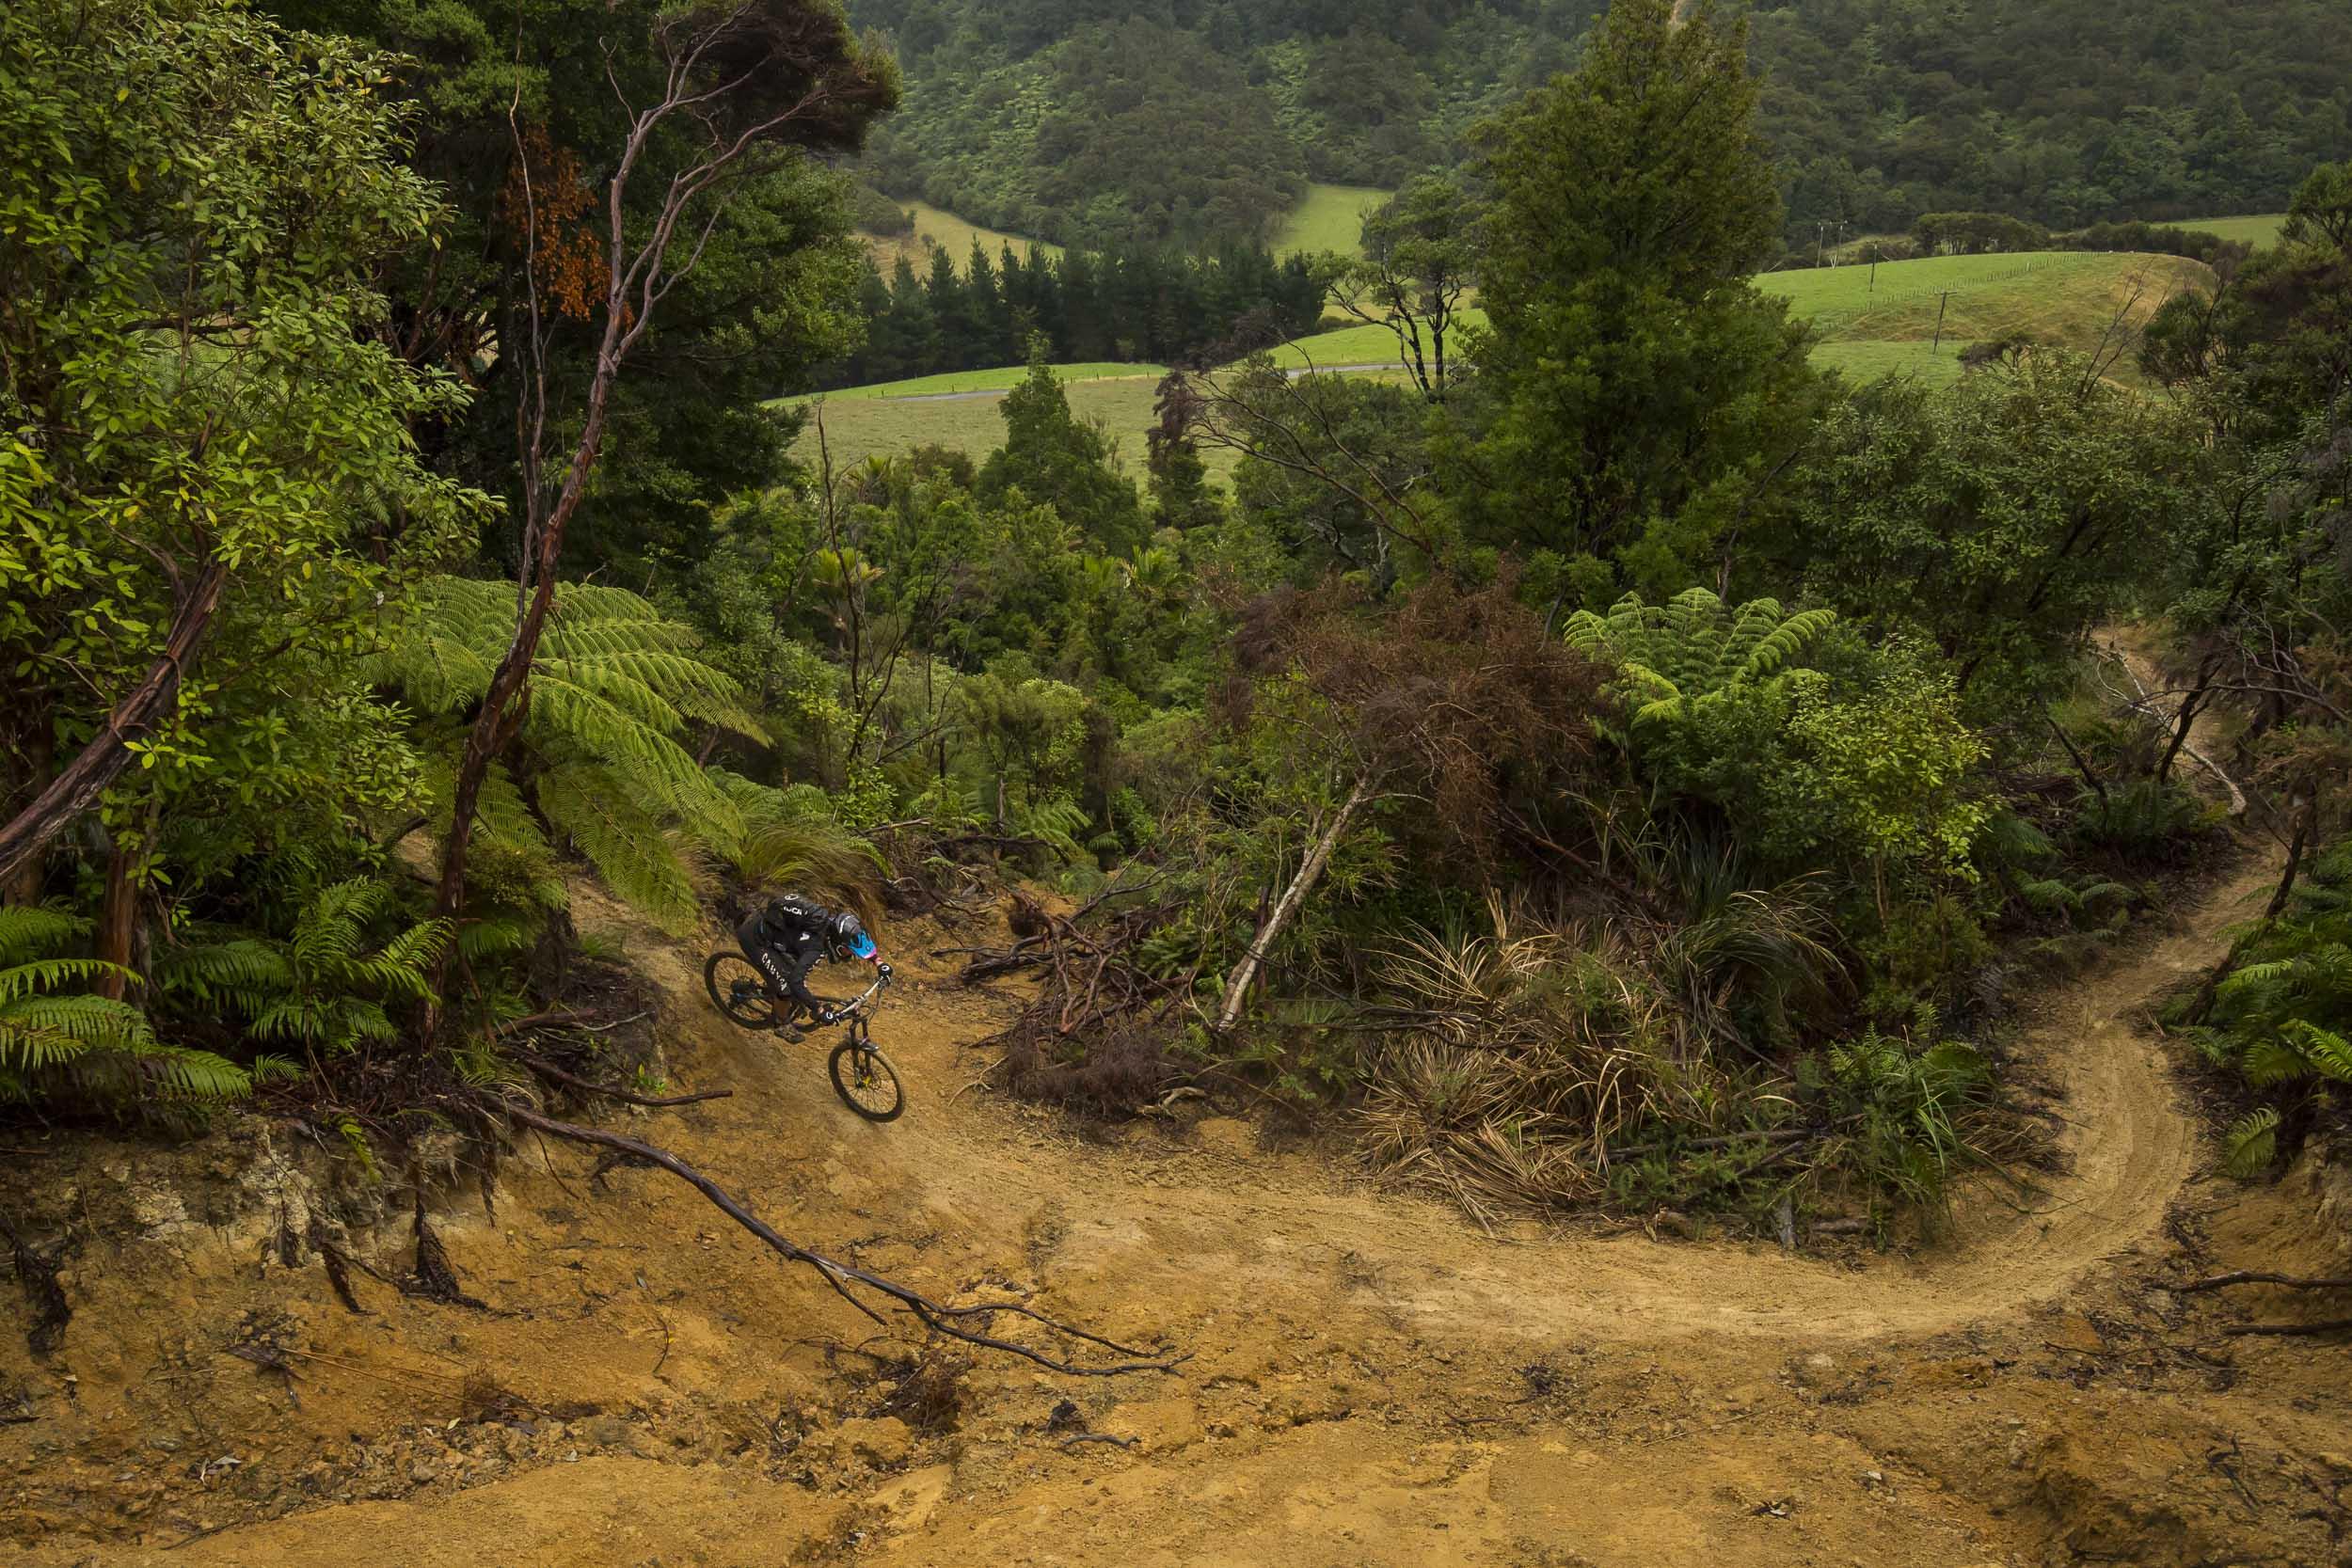 NK_NZ_Enduro_Day2-20.jpg